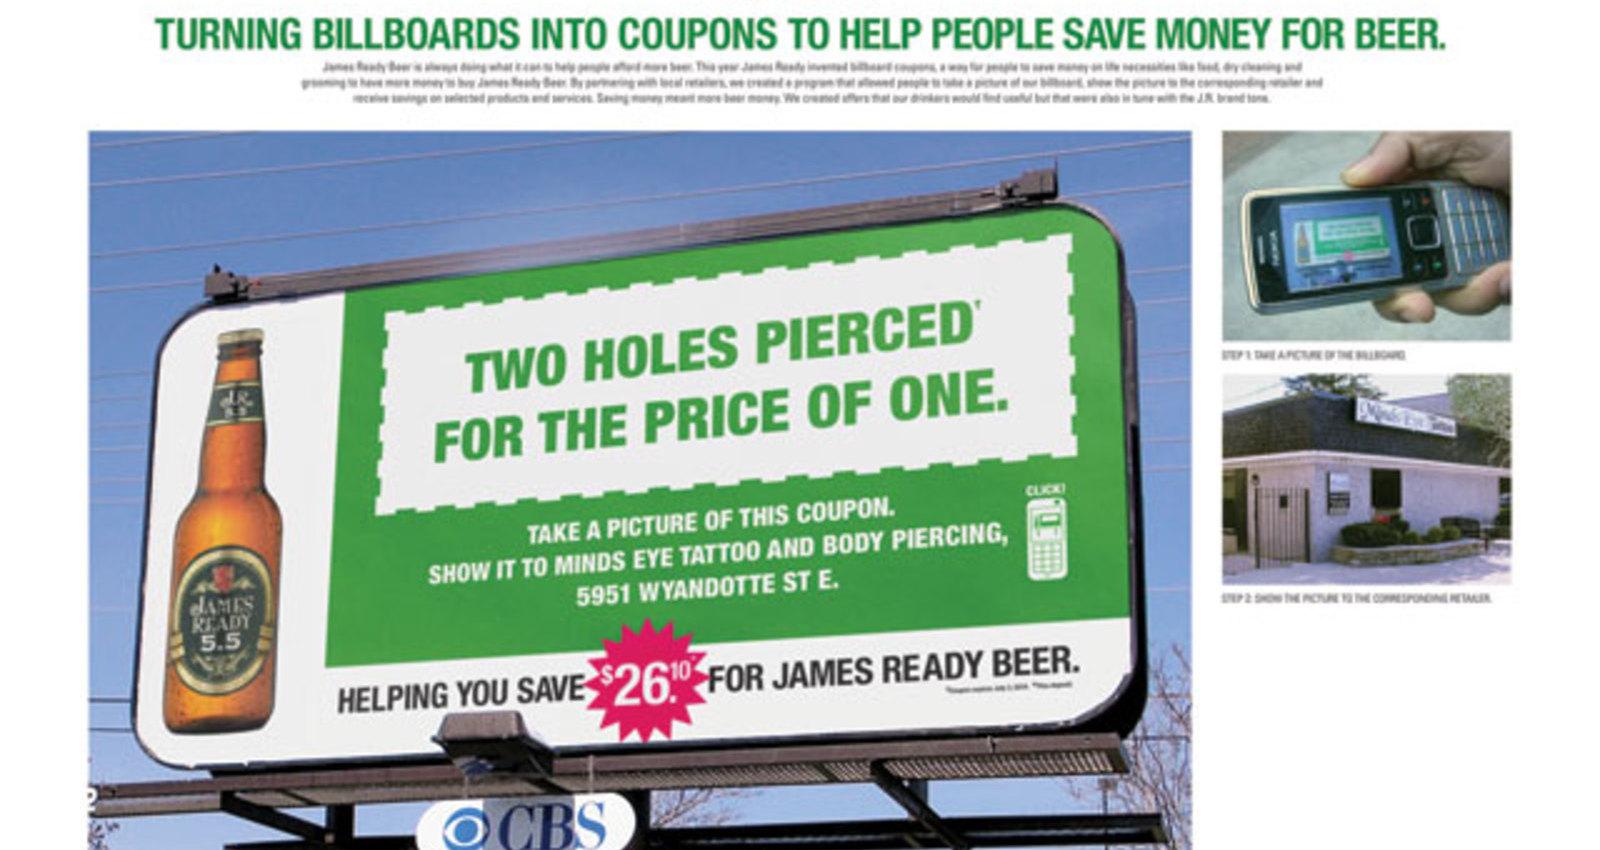 James Ready Coupon Billboard -